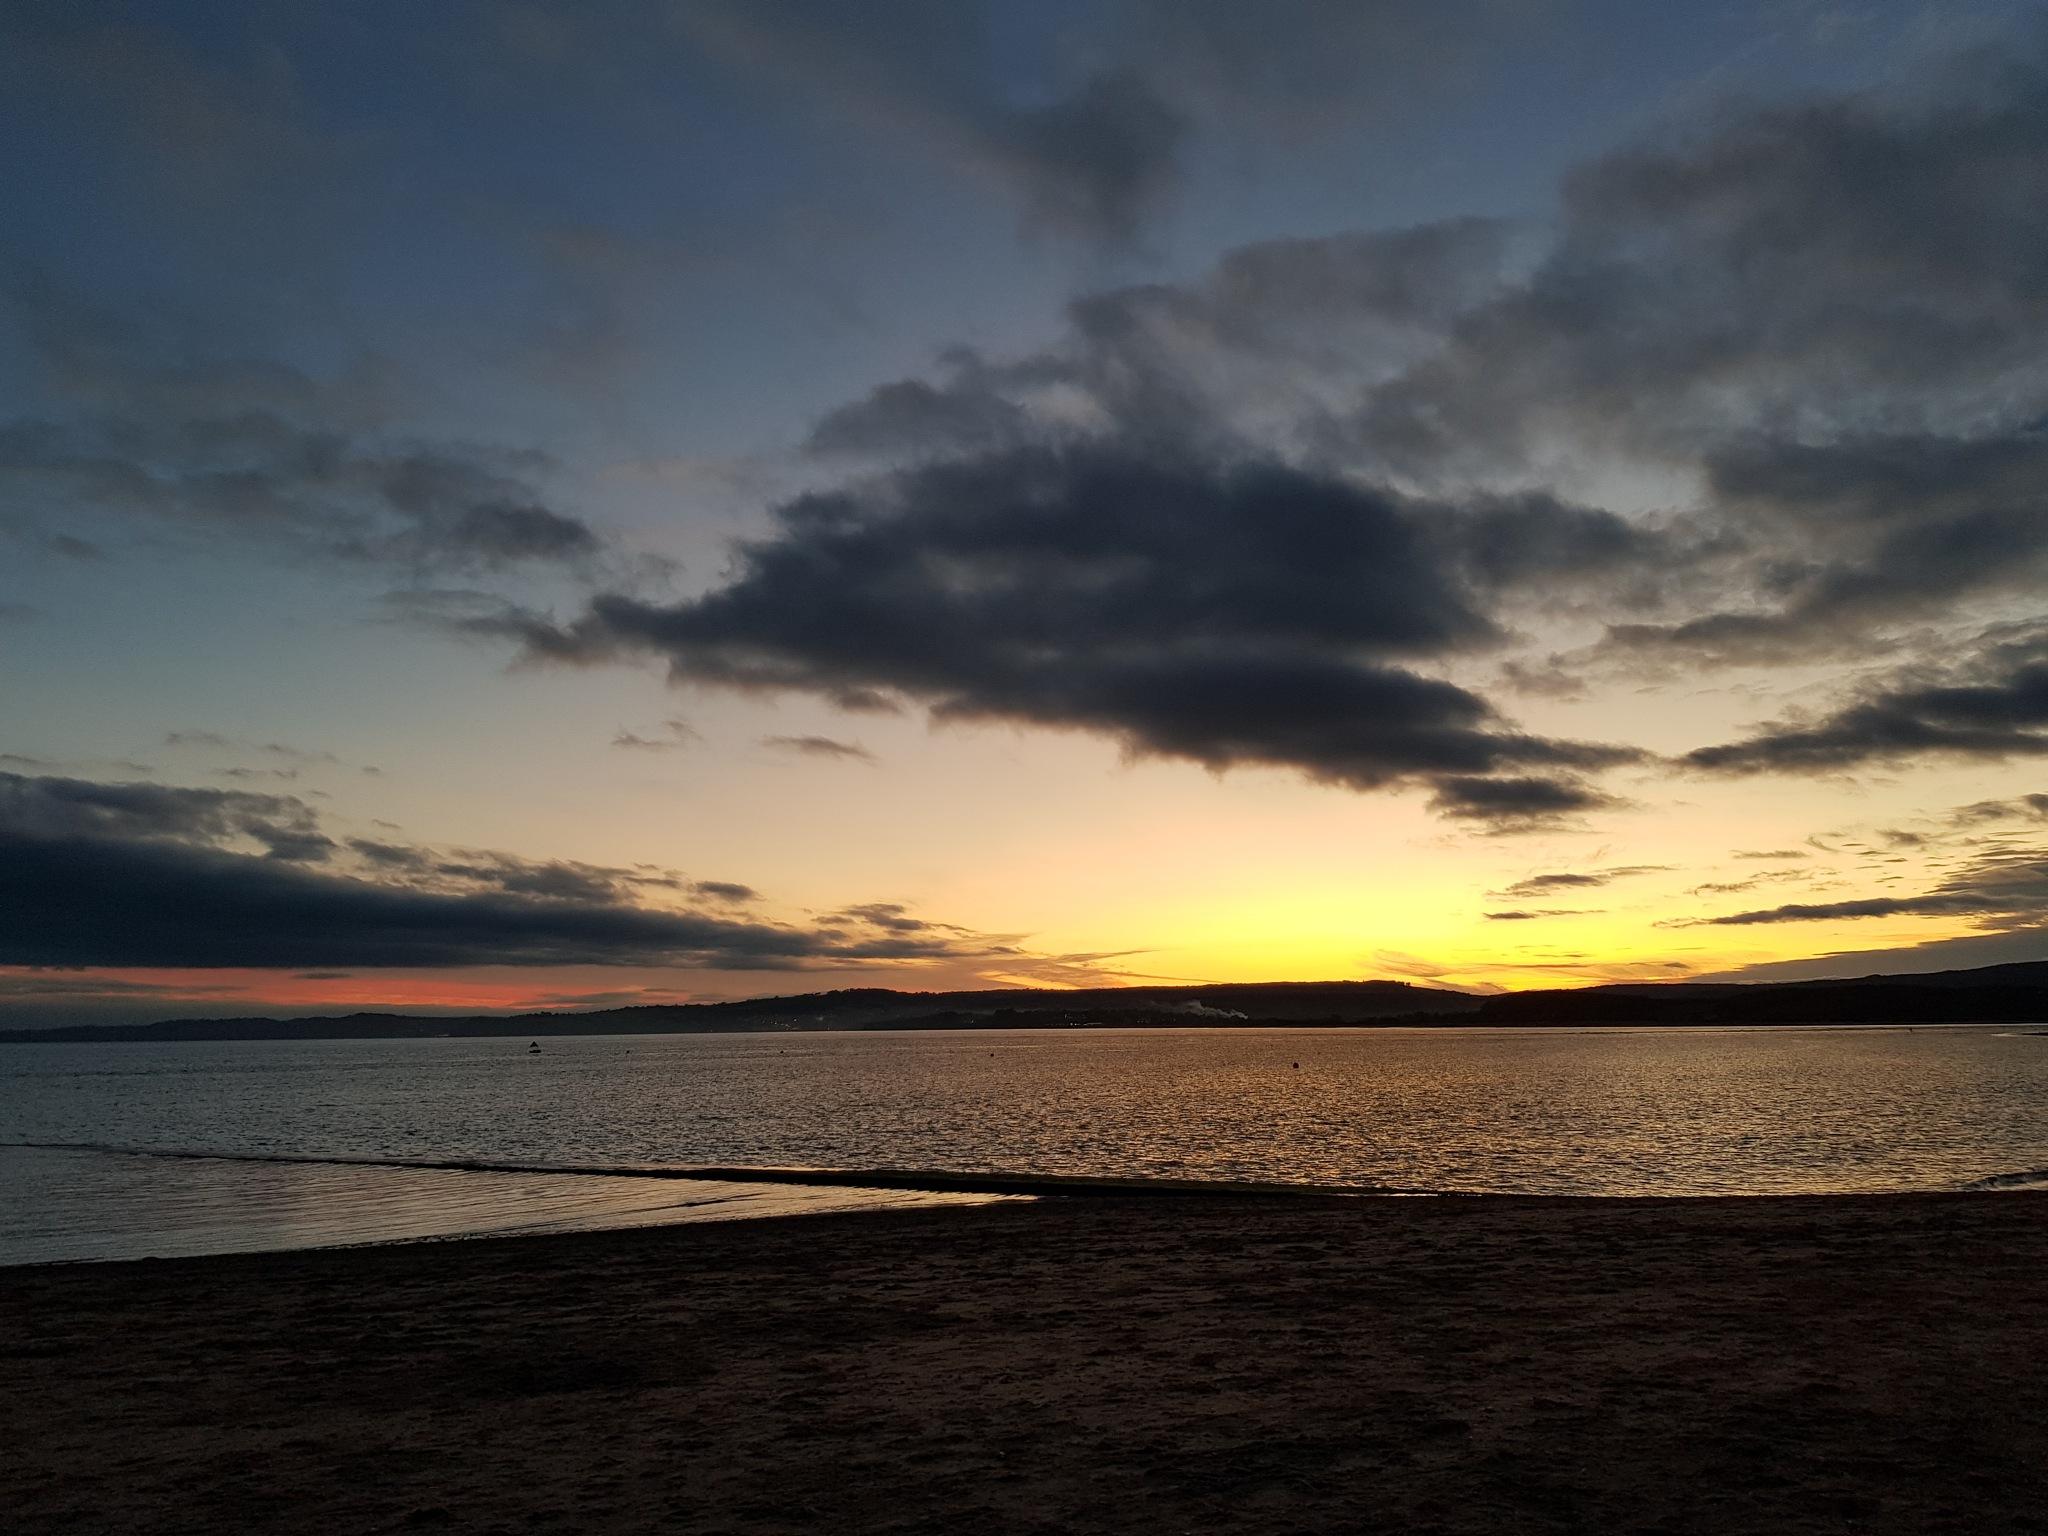 sunset by chris_ironside